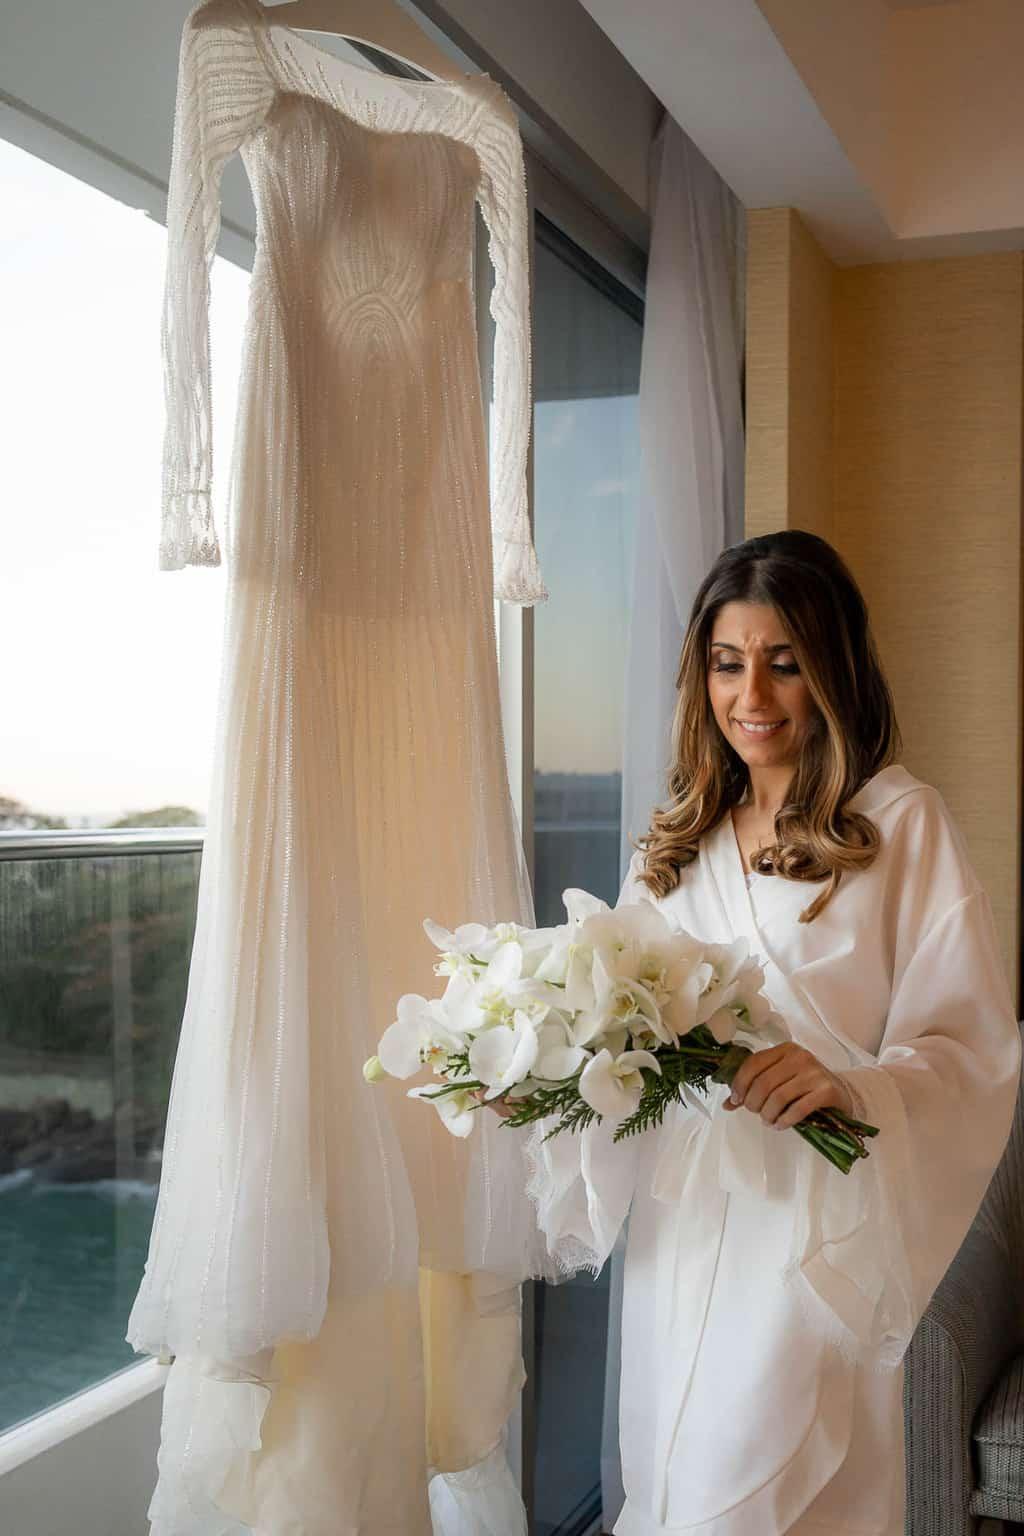 buque-casamento-luiza-e-gustavo-cerimonial-casamento-de-ideias-fotografia-lenine-serejo-making-of-vestido-de-noiva3